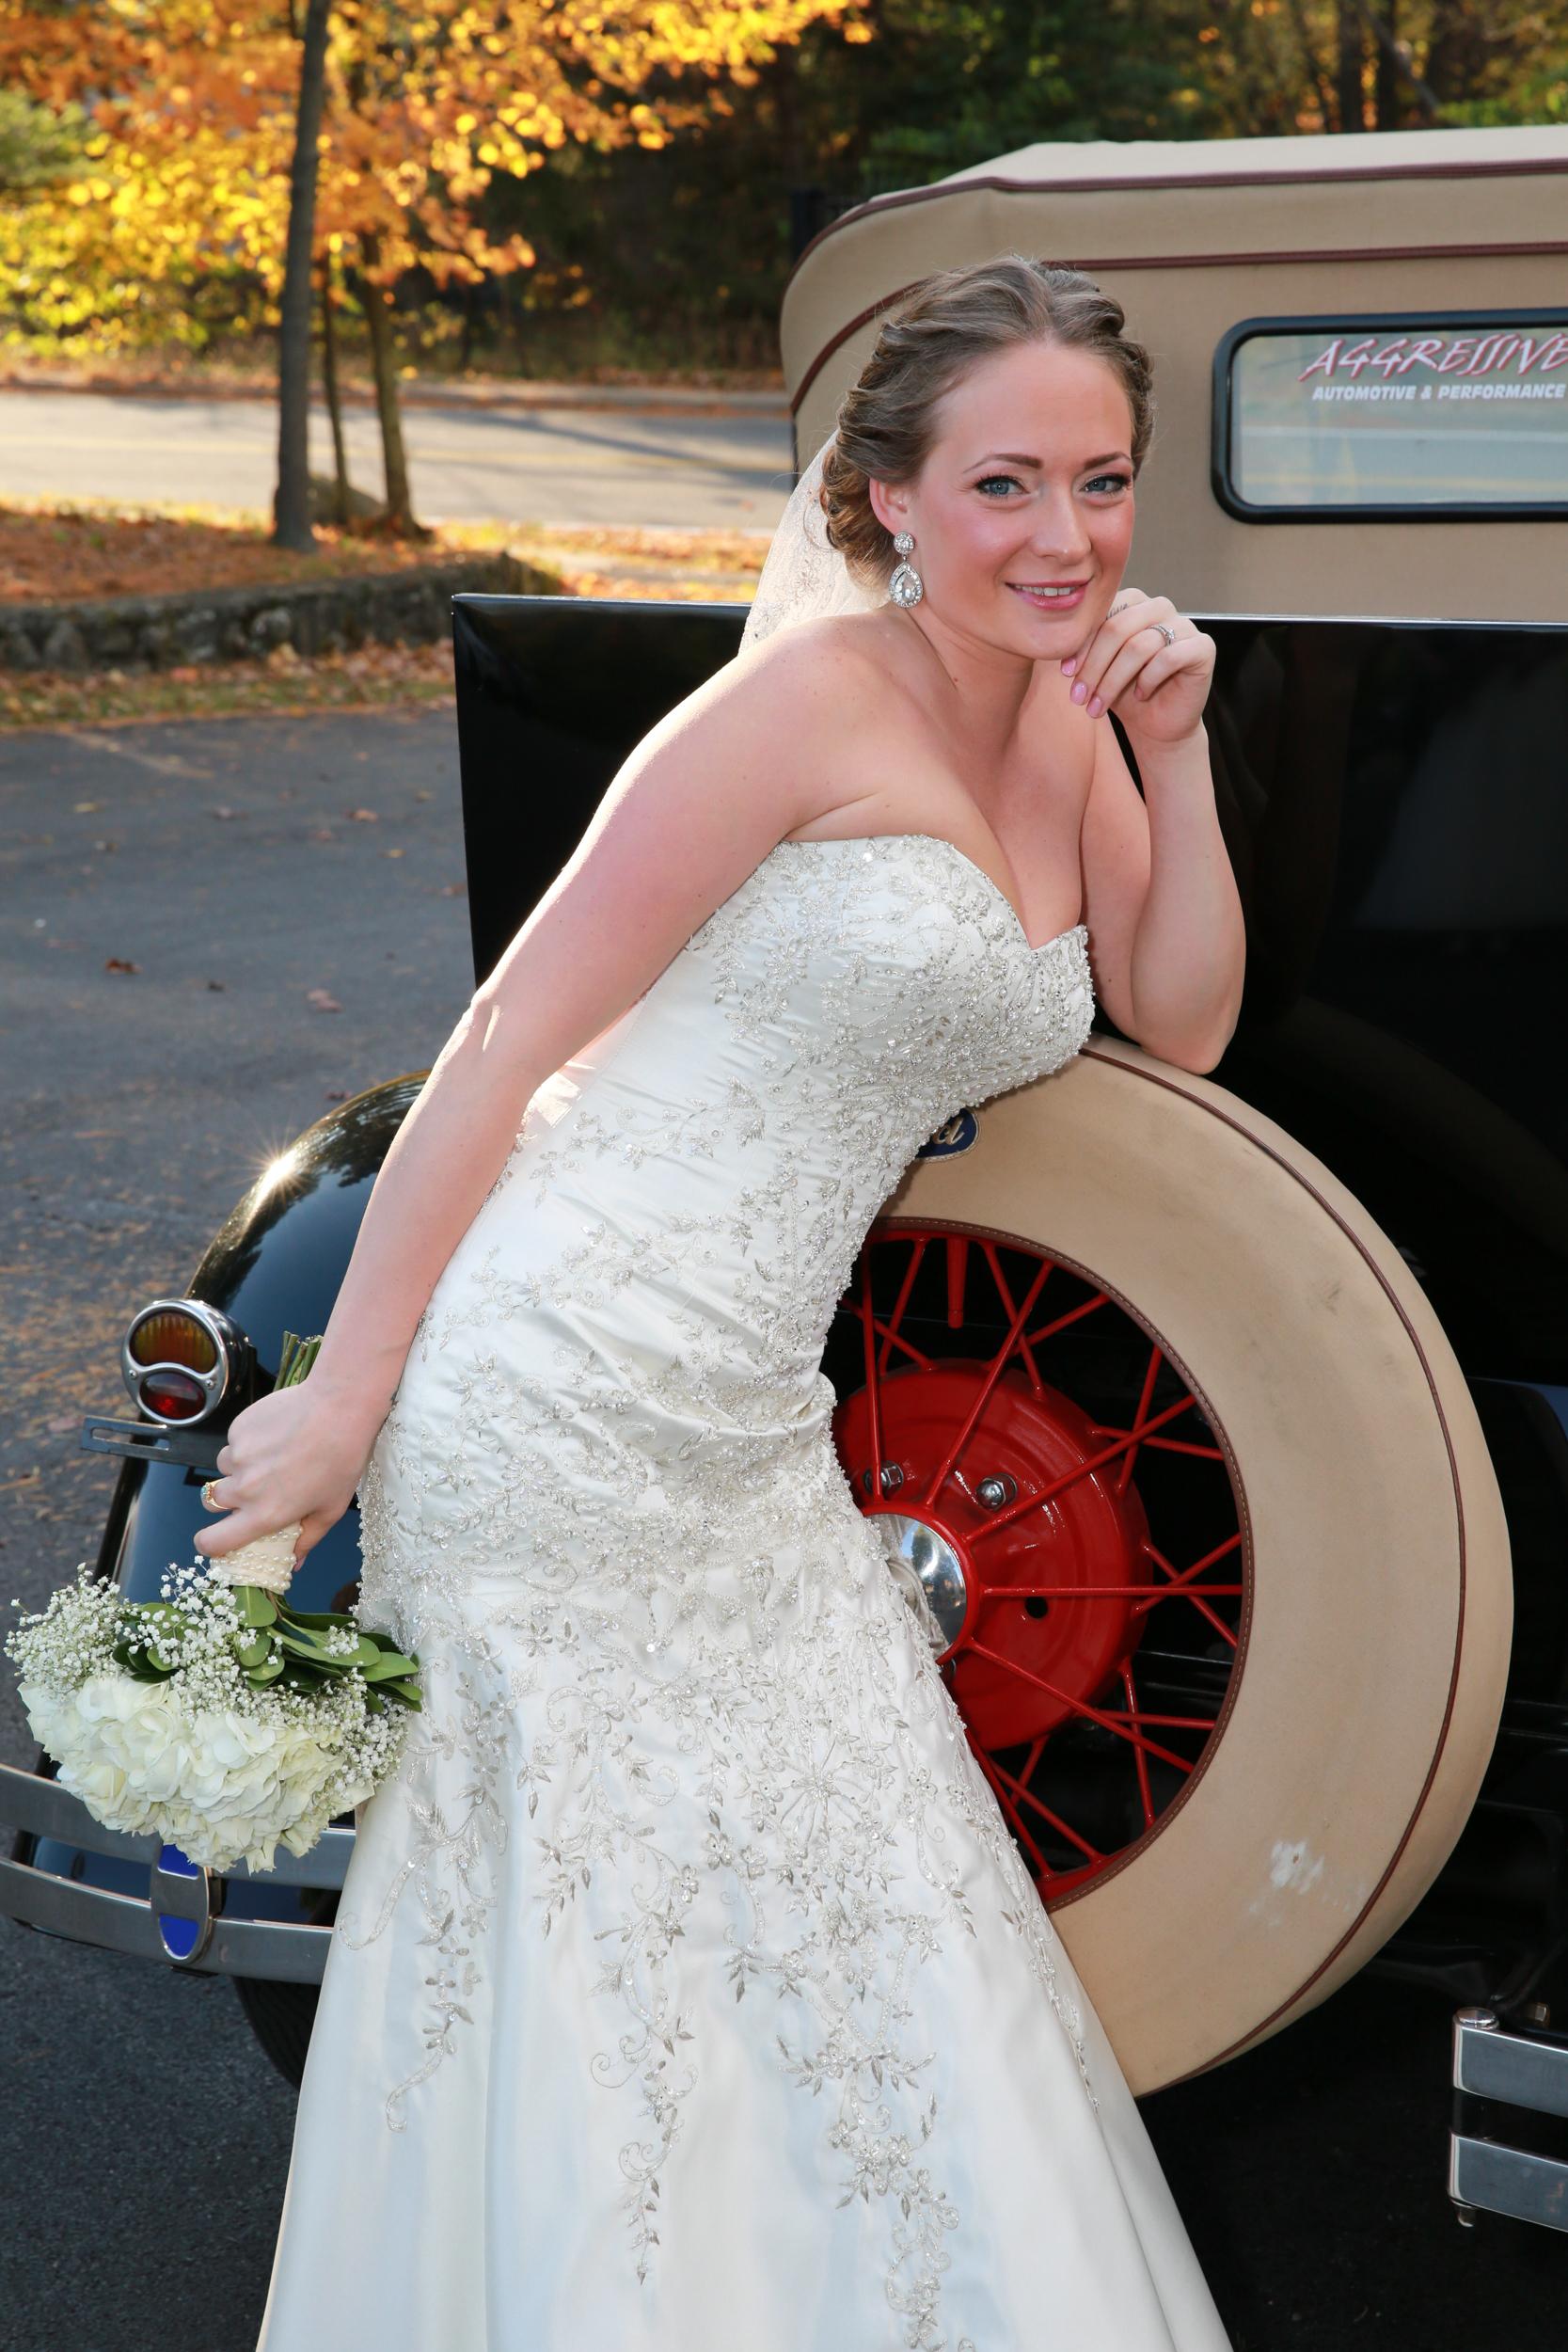 Bride having fun with antique car